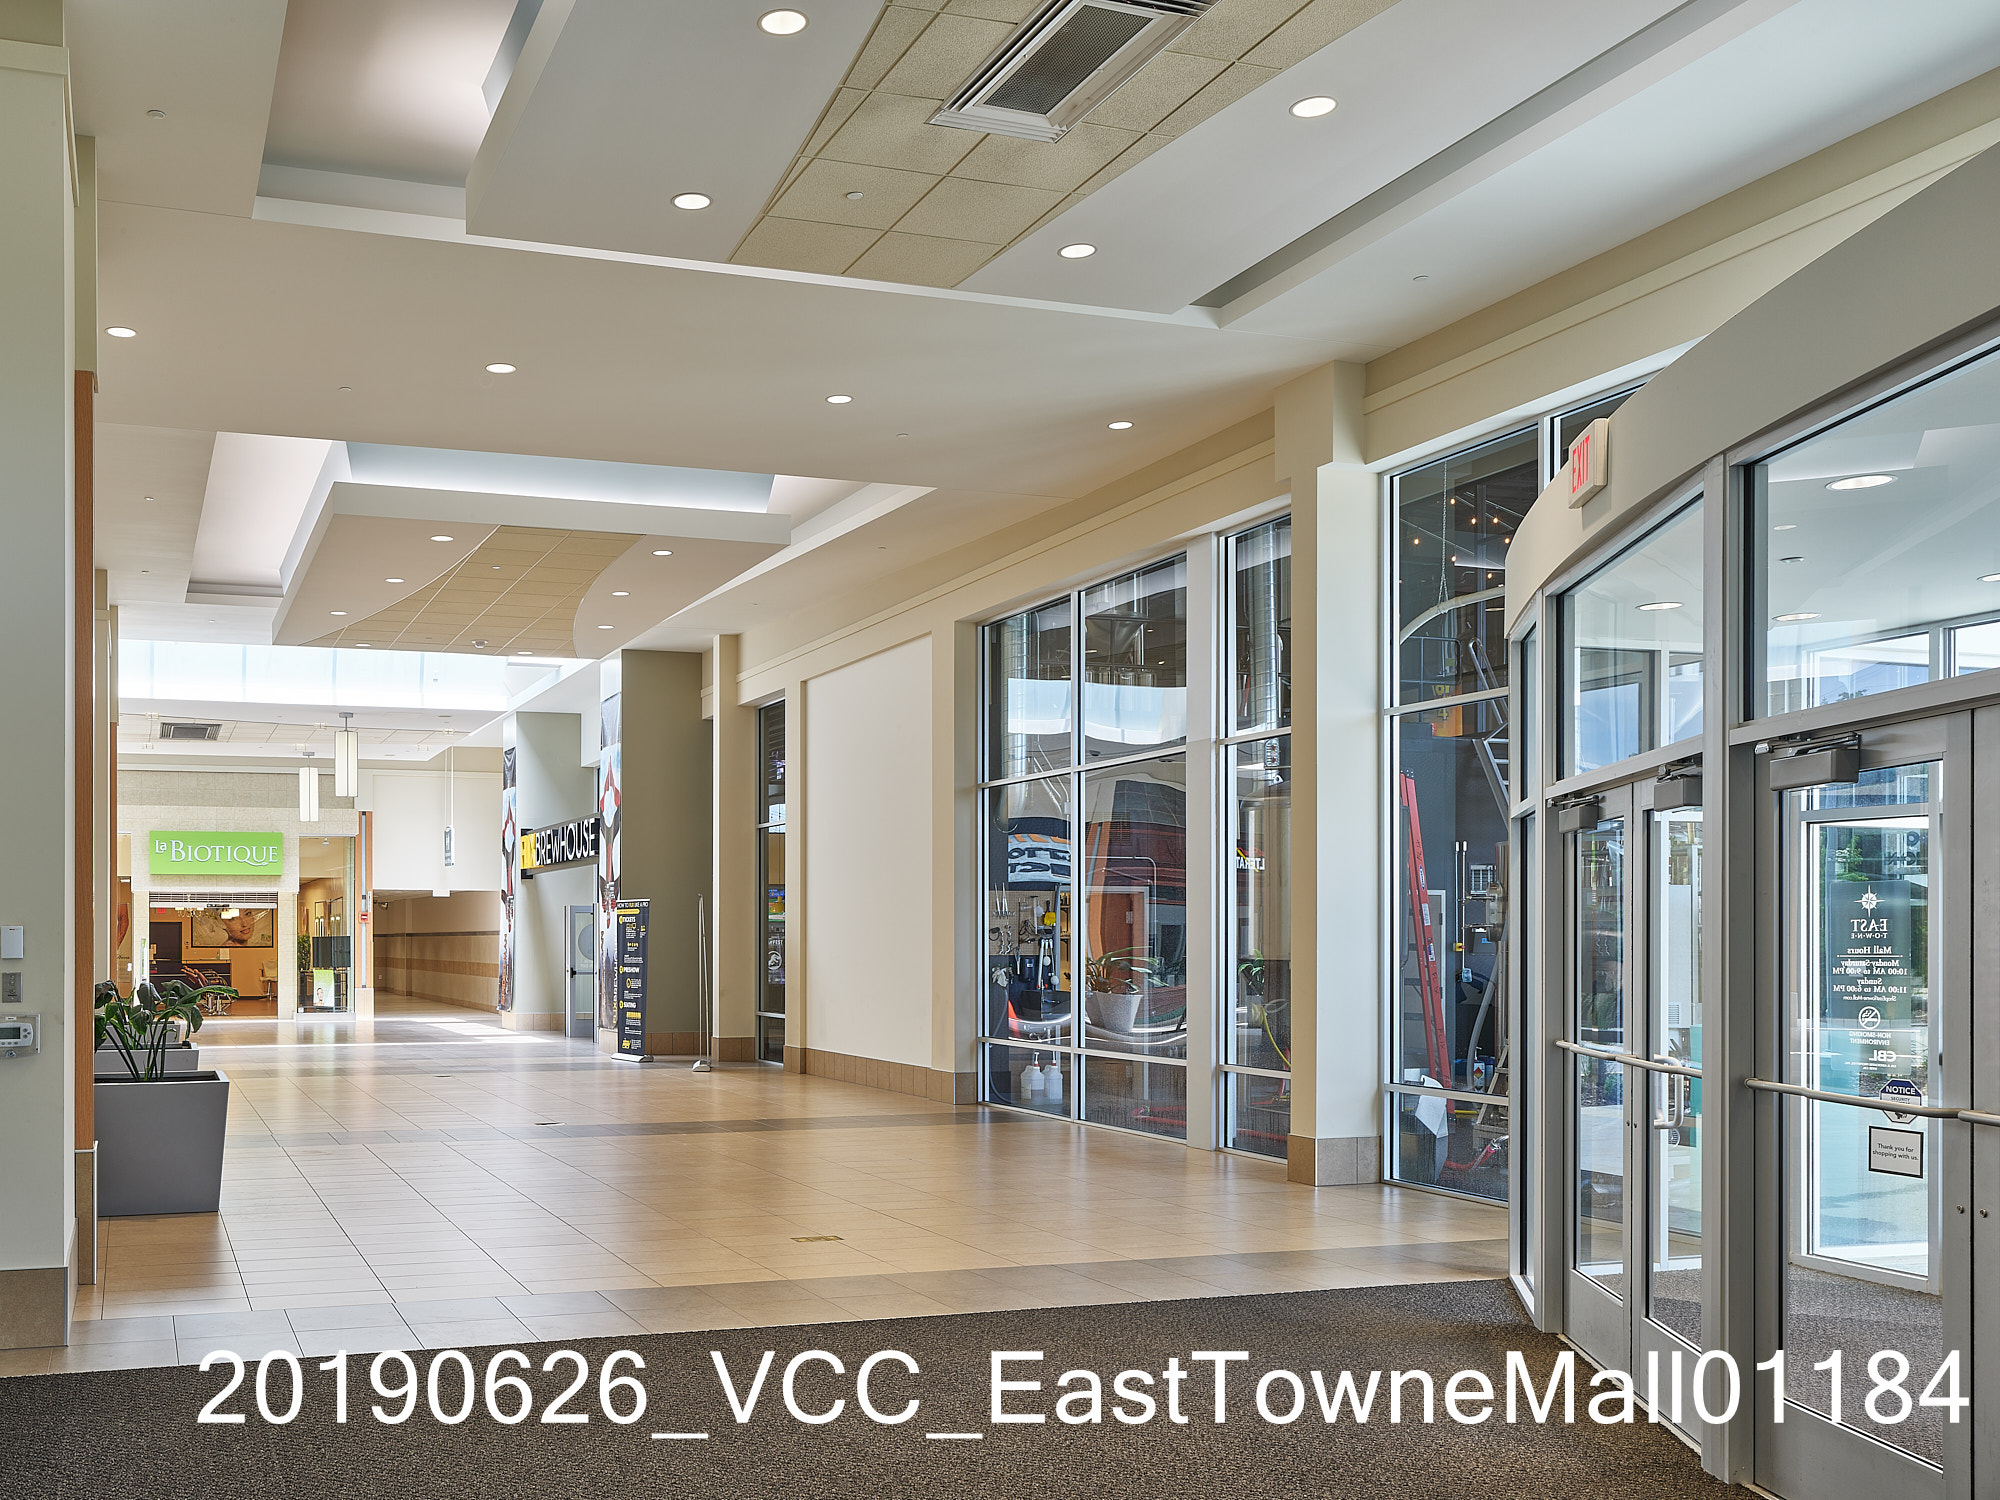 20190626_VCC_EastTowneMall01184.jpg